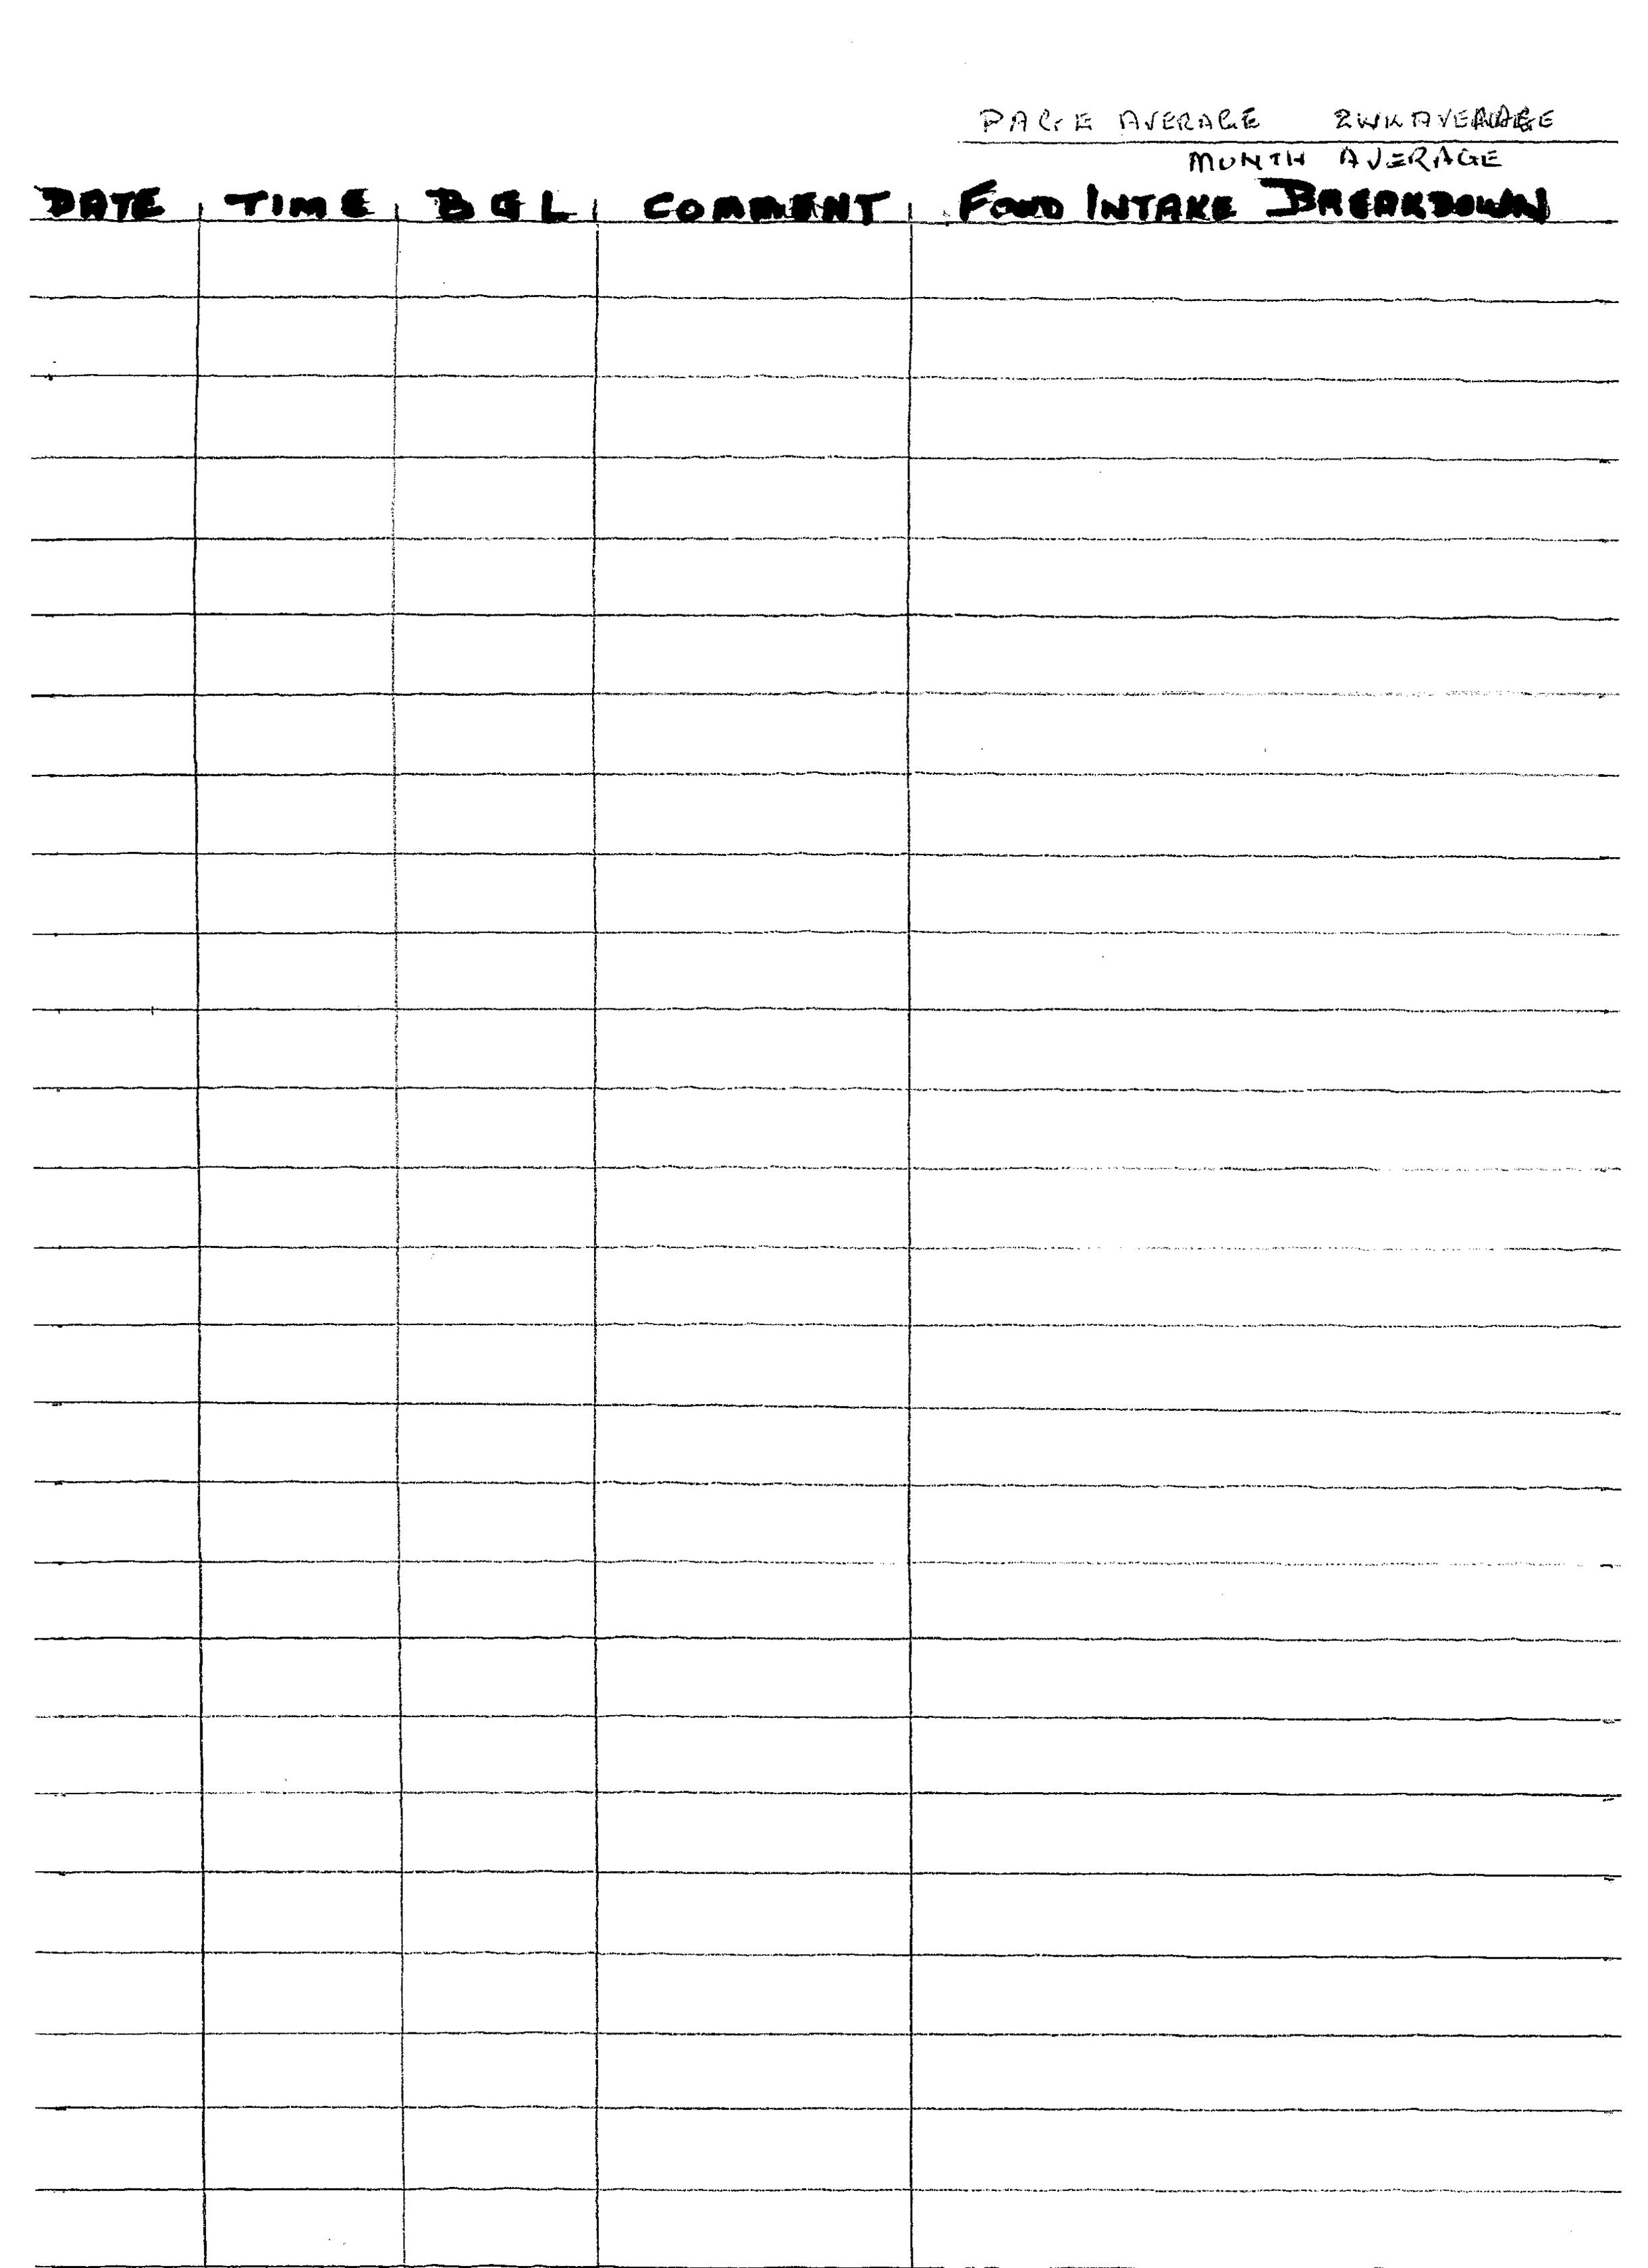 diabetic daily log sheet